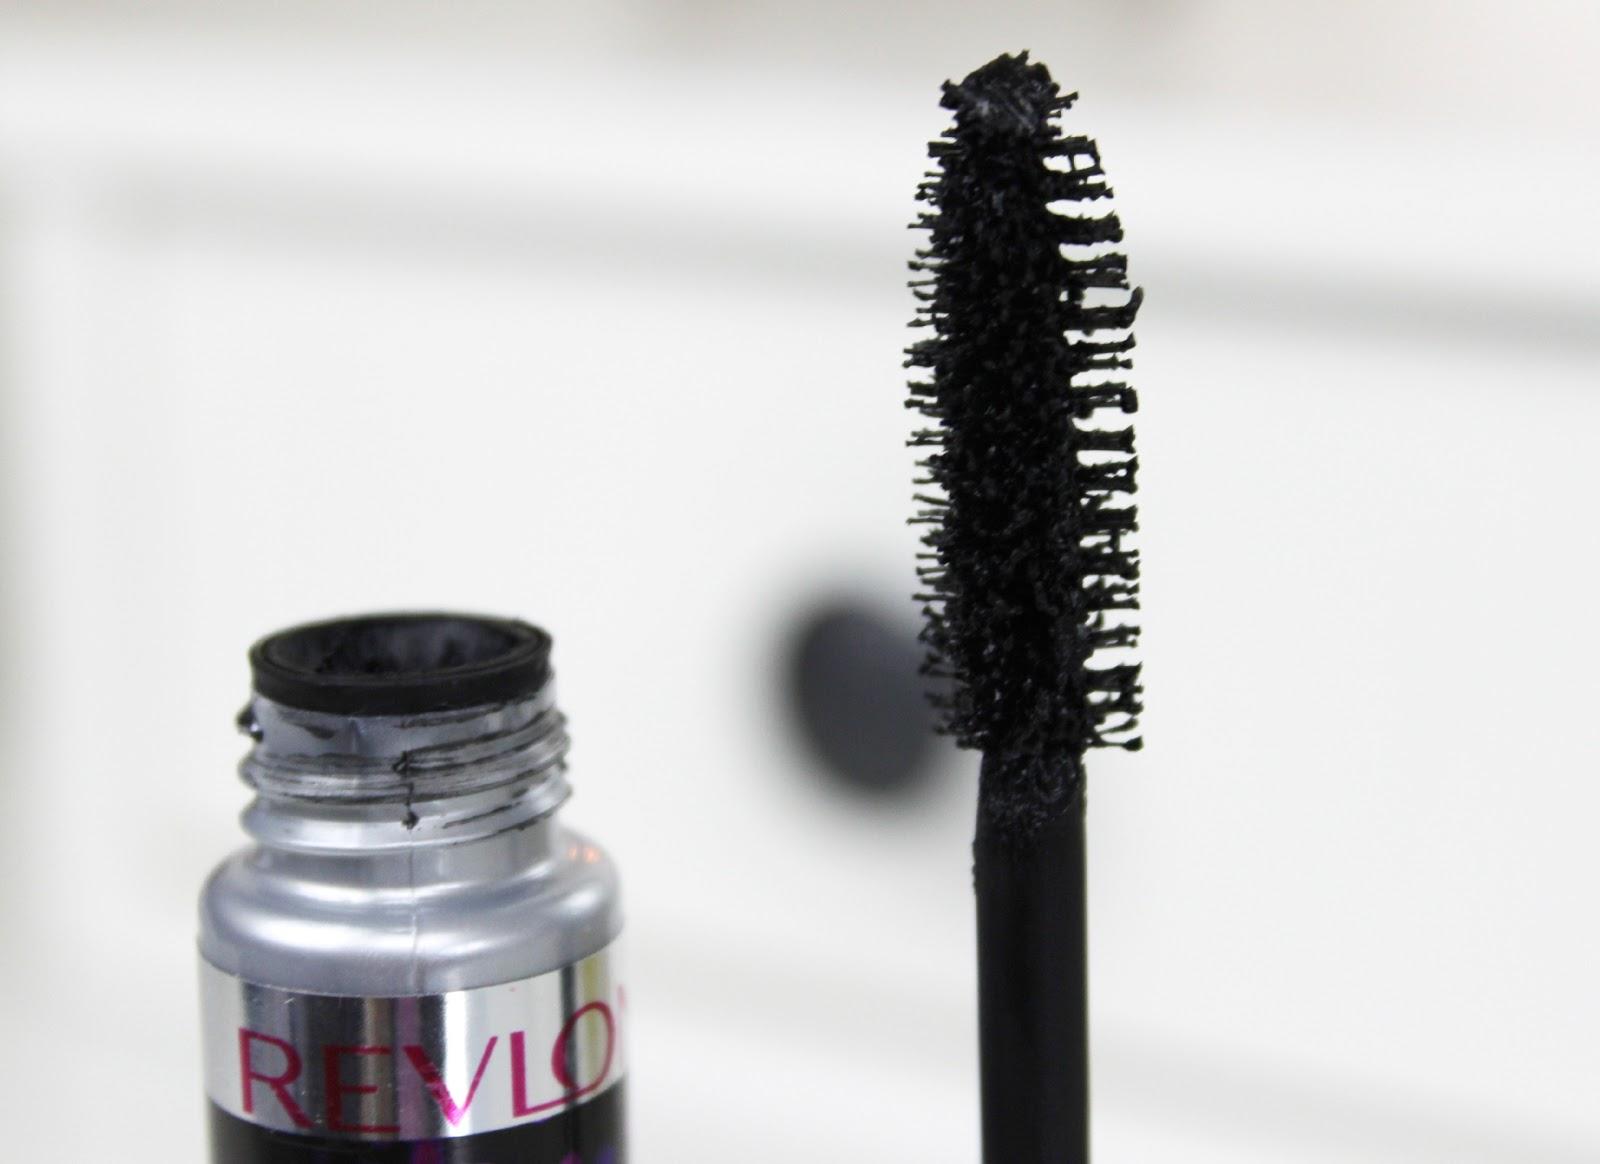 Revlon Lash Potion Mascara By Grow Luscious Review